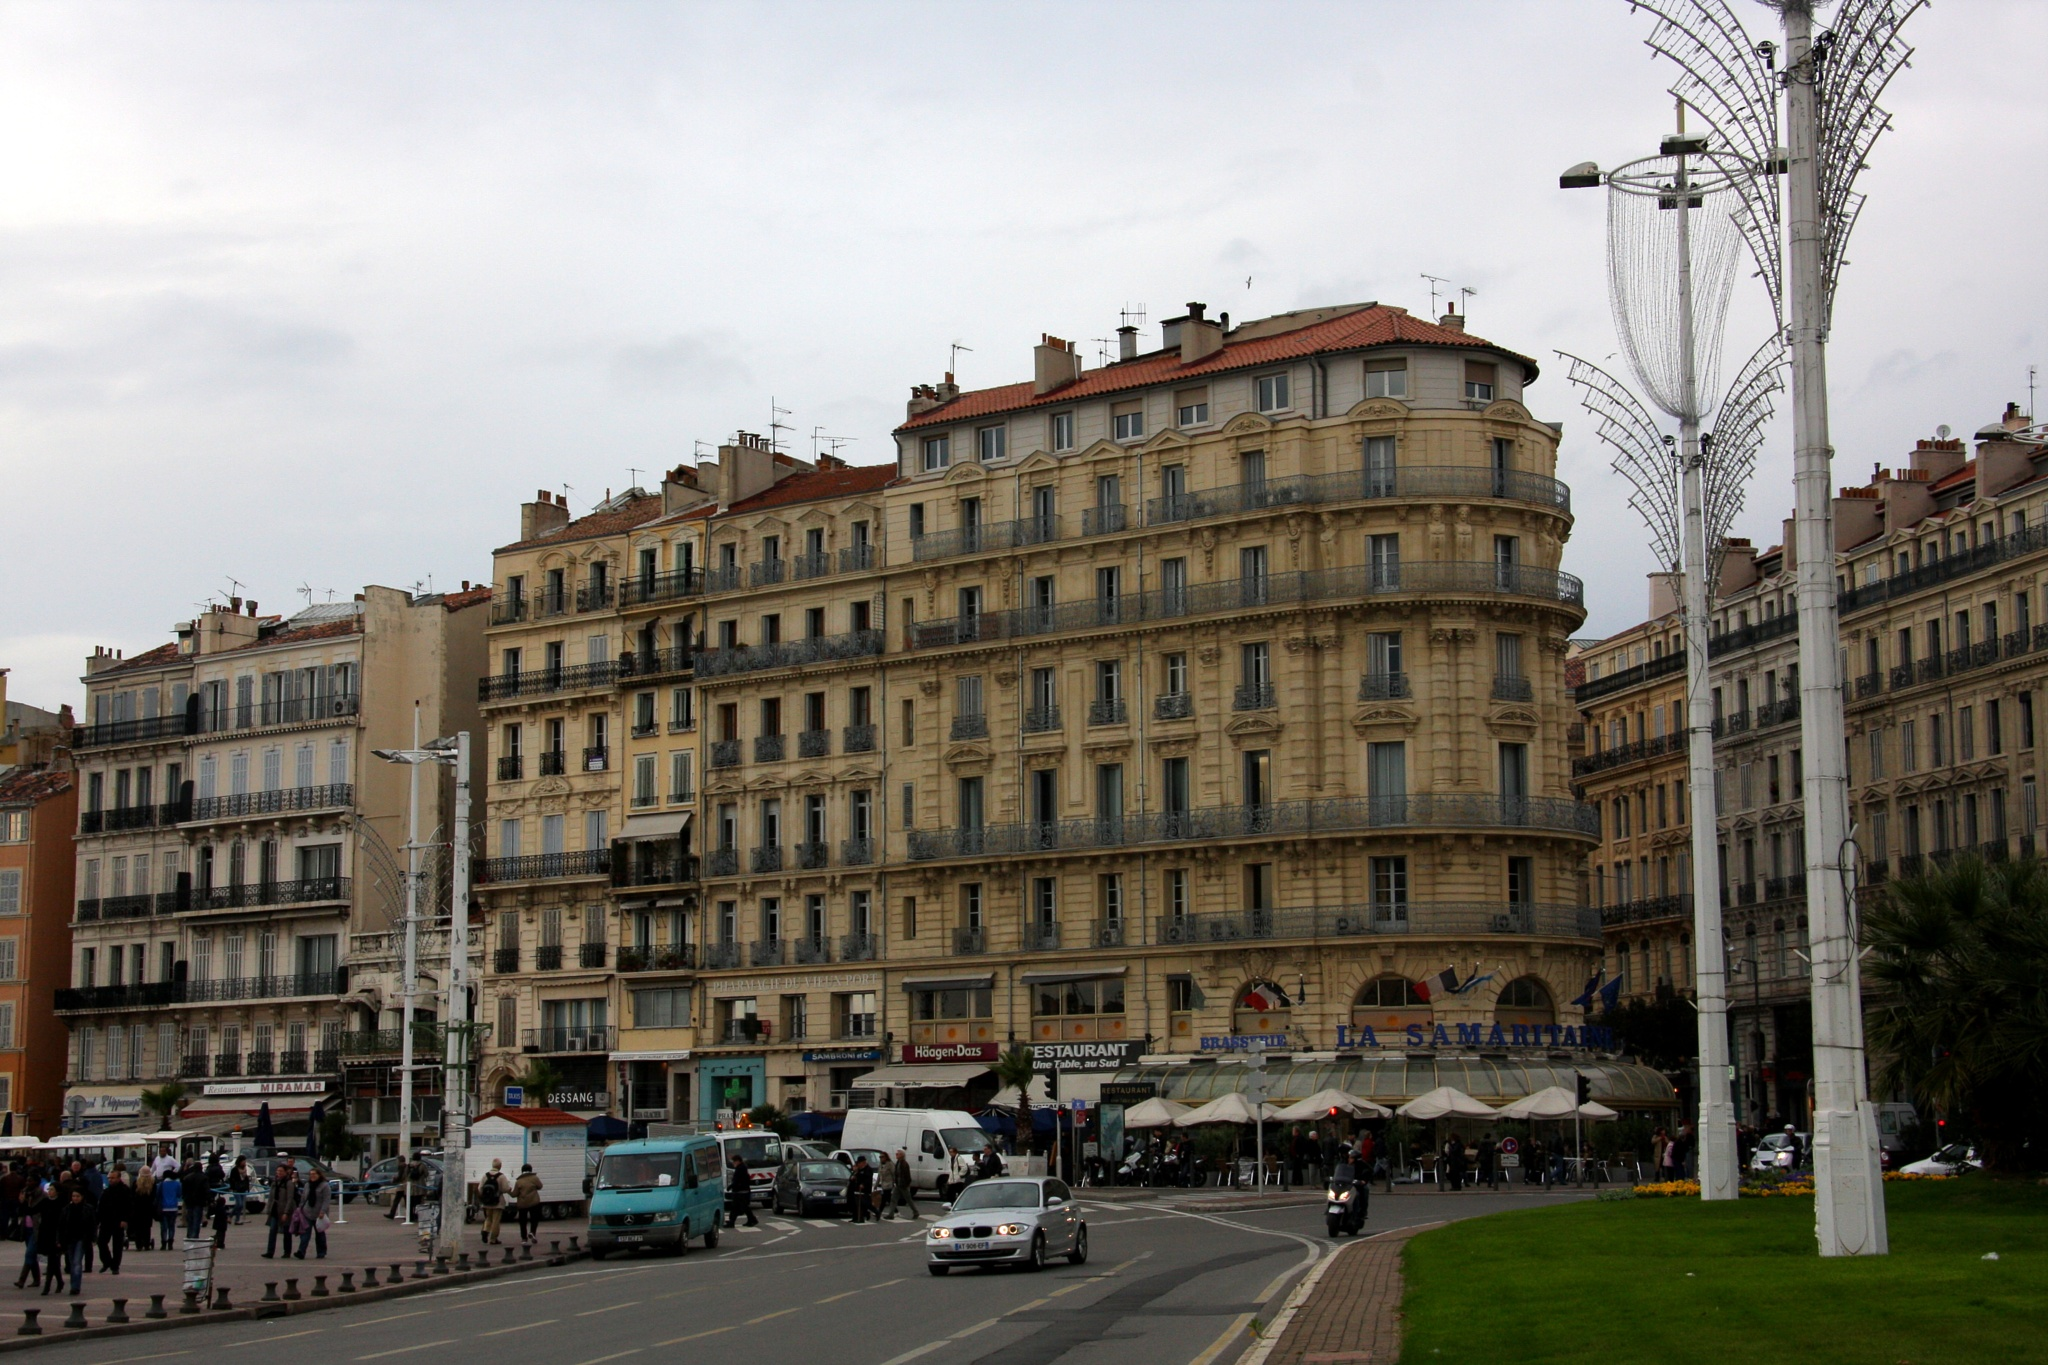 Marseille by Atila_Yumusakkaya